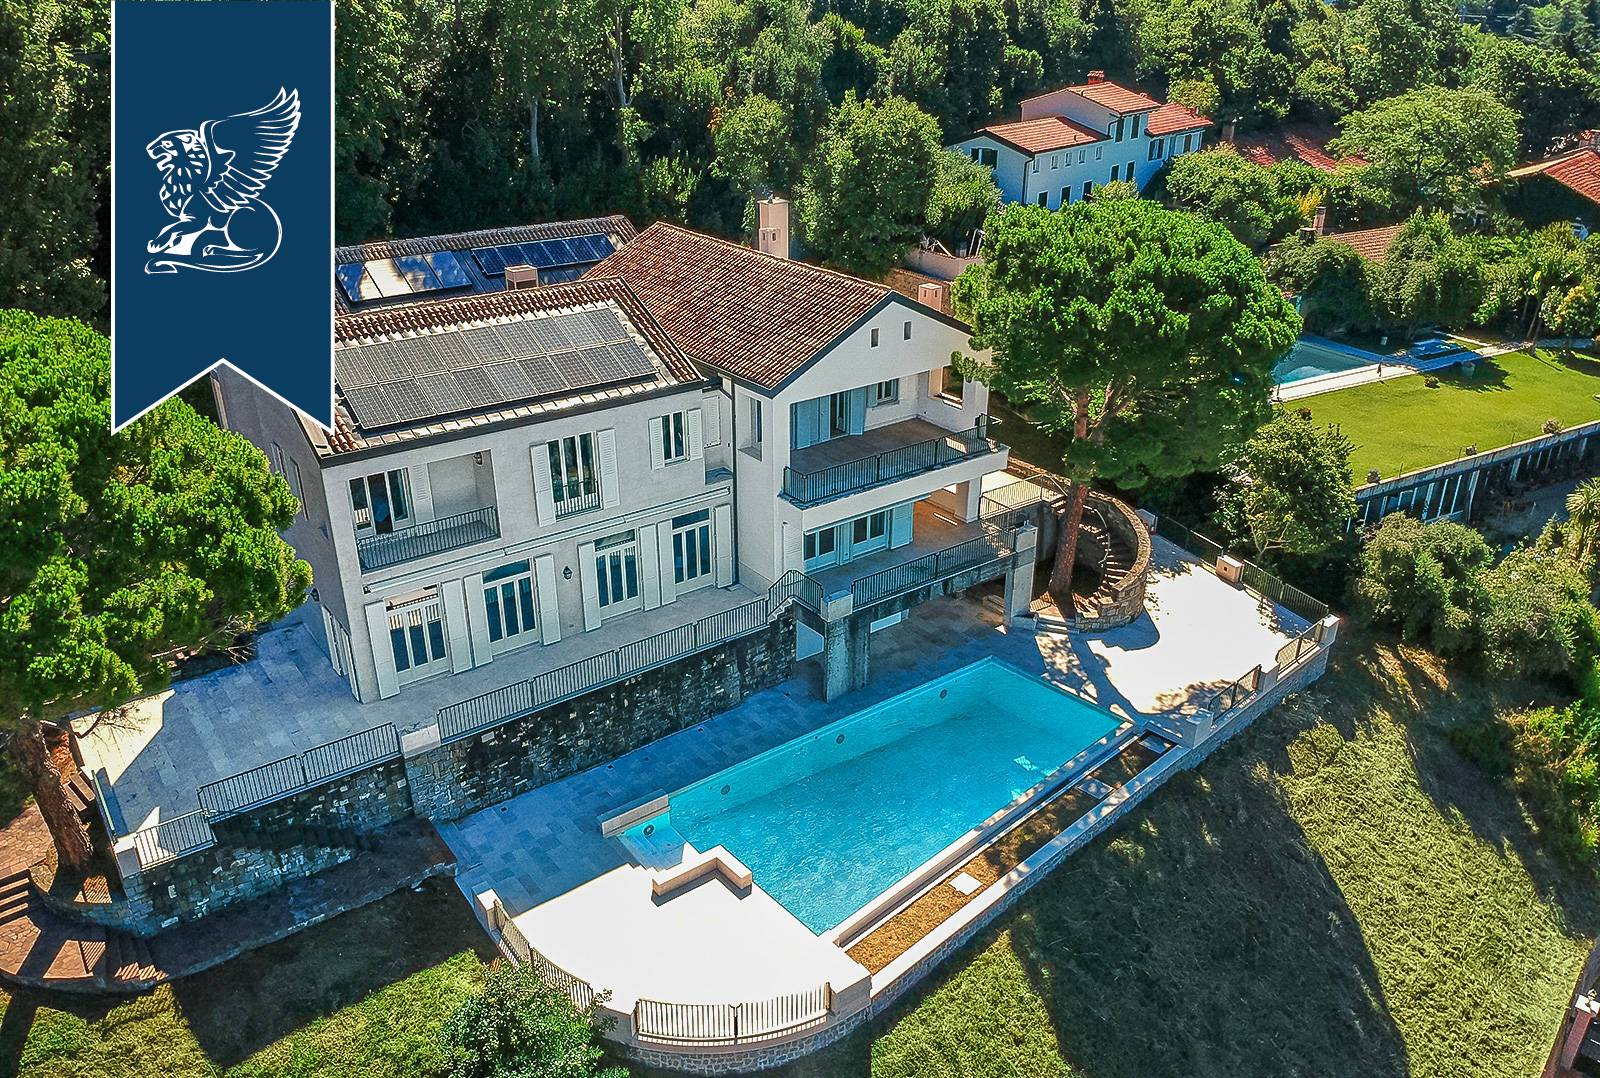 Villa in Vendita a Trieste: 0 locali, 900 mq - Foto 3